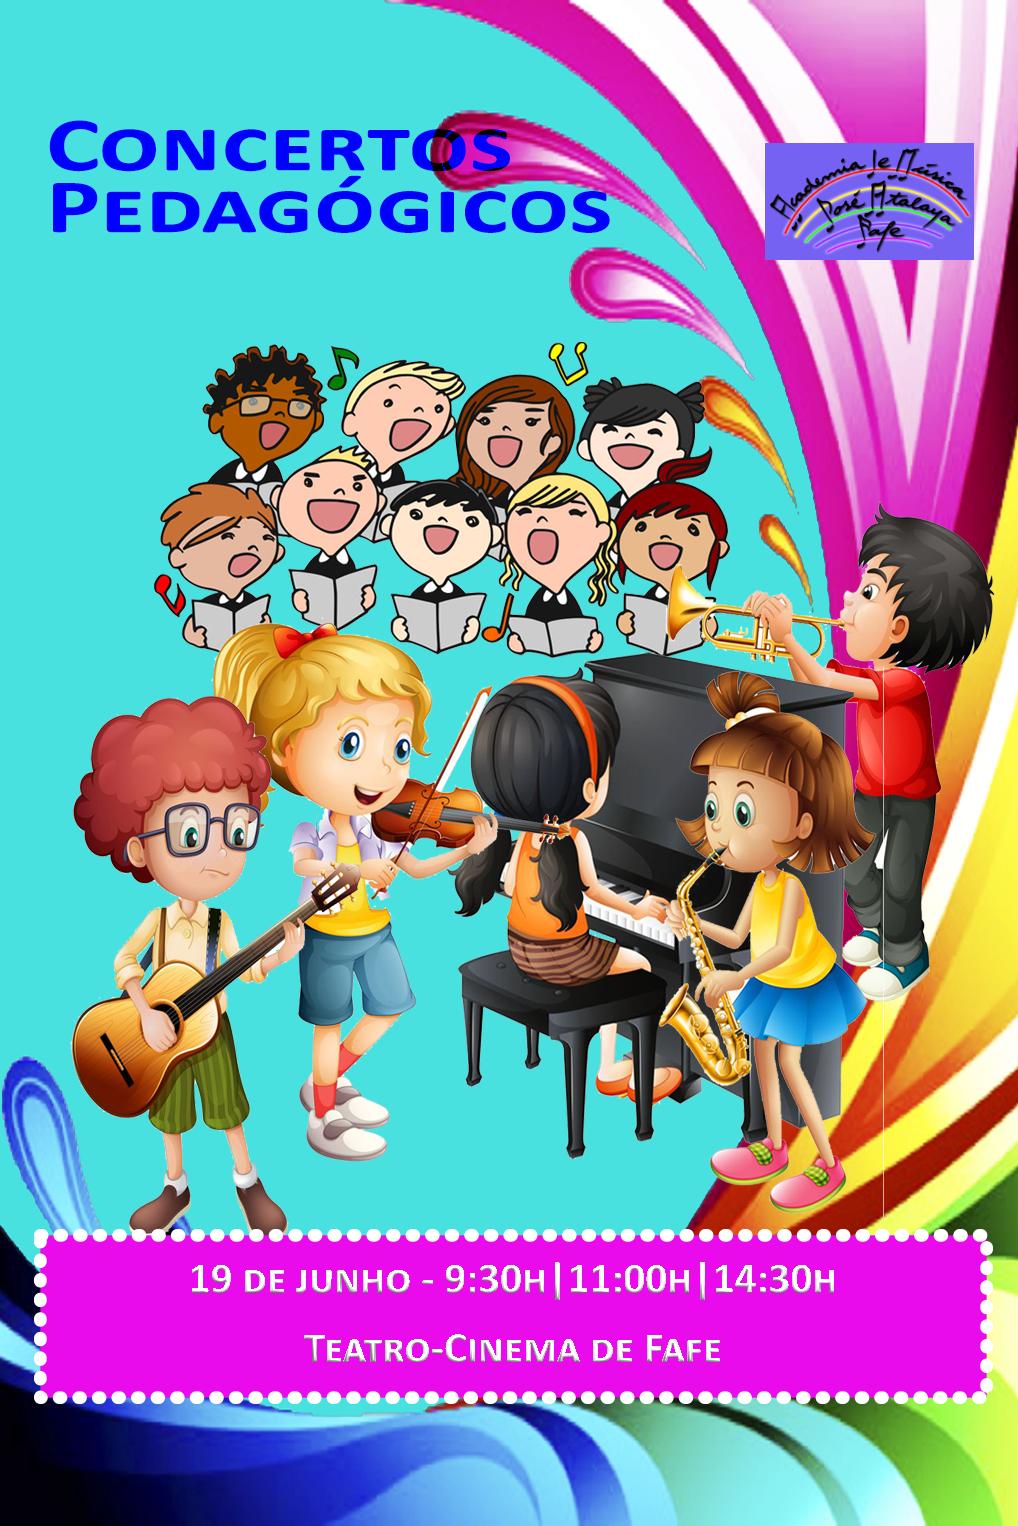 concerto-pedagogico-19-06